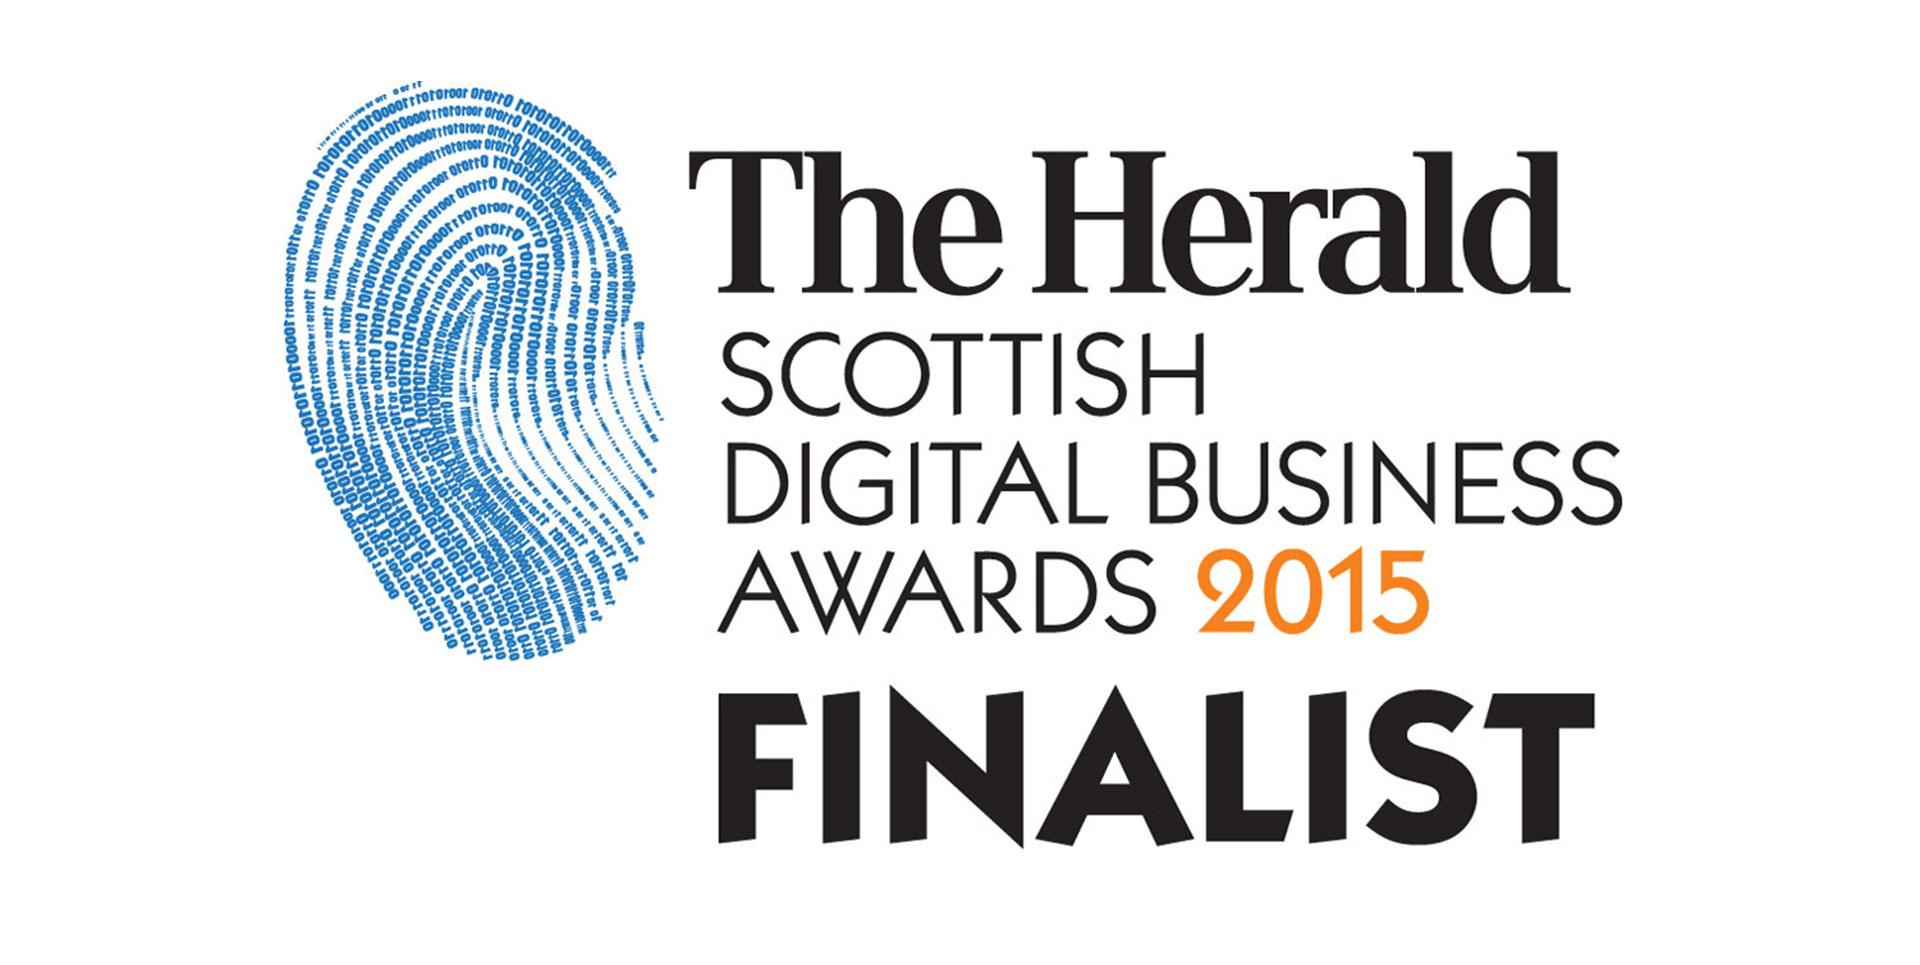 The Herald Scottish Digital Business Awards 2015